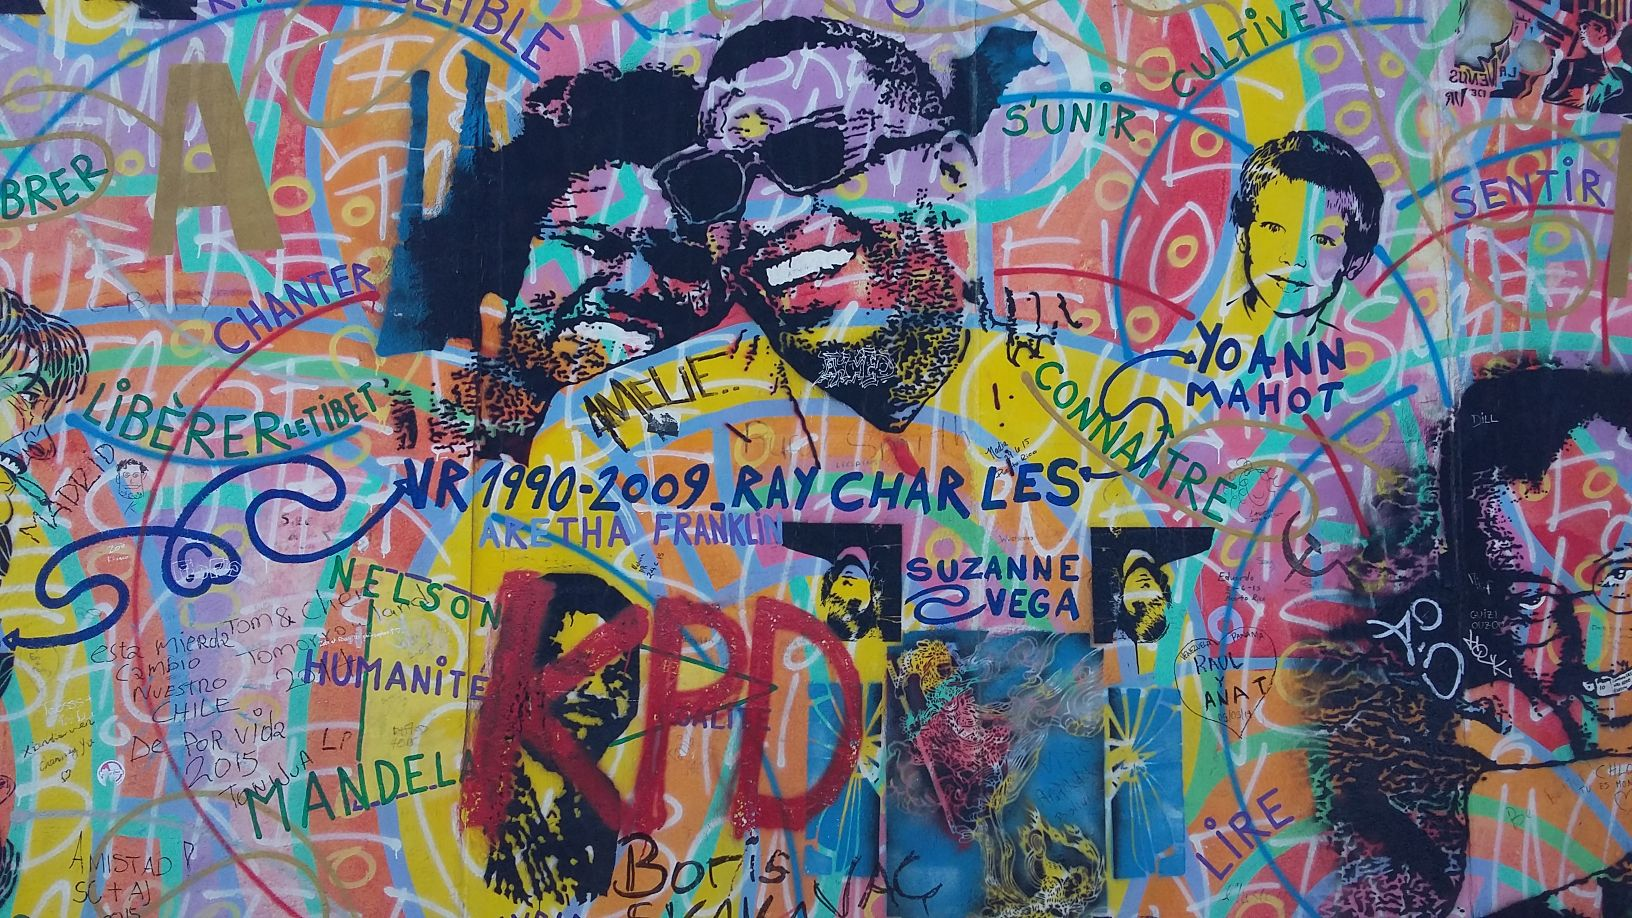 Ray charles graffiti berlin wall east side gallery